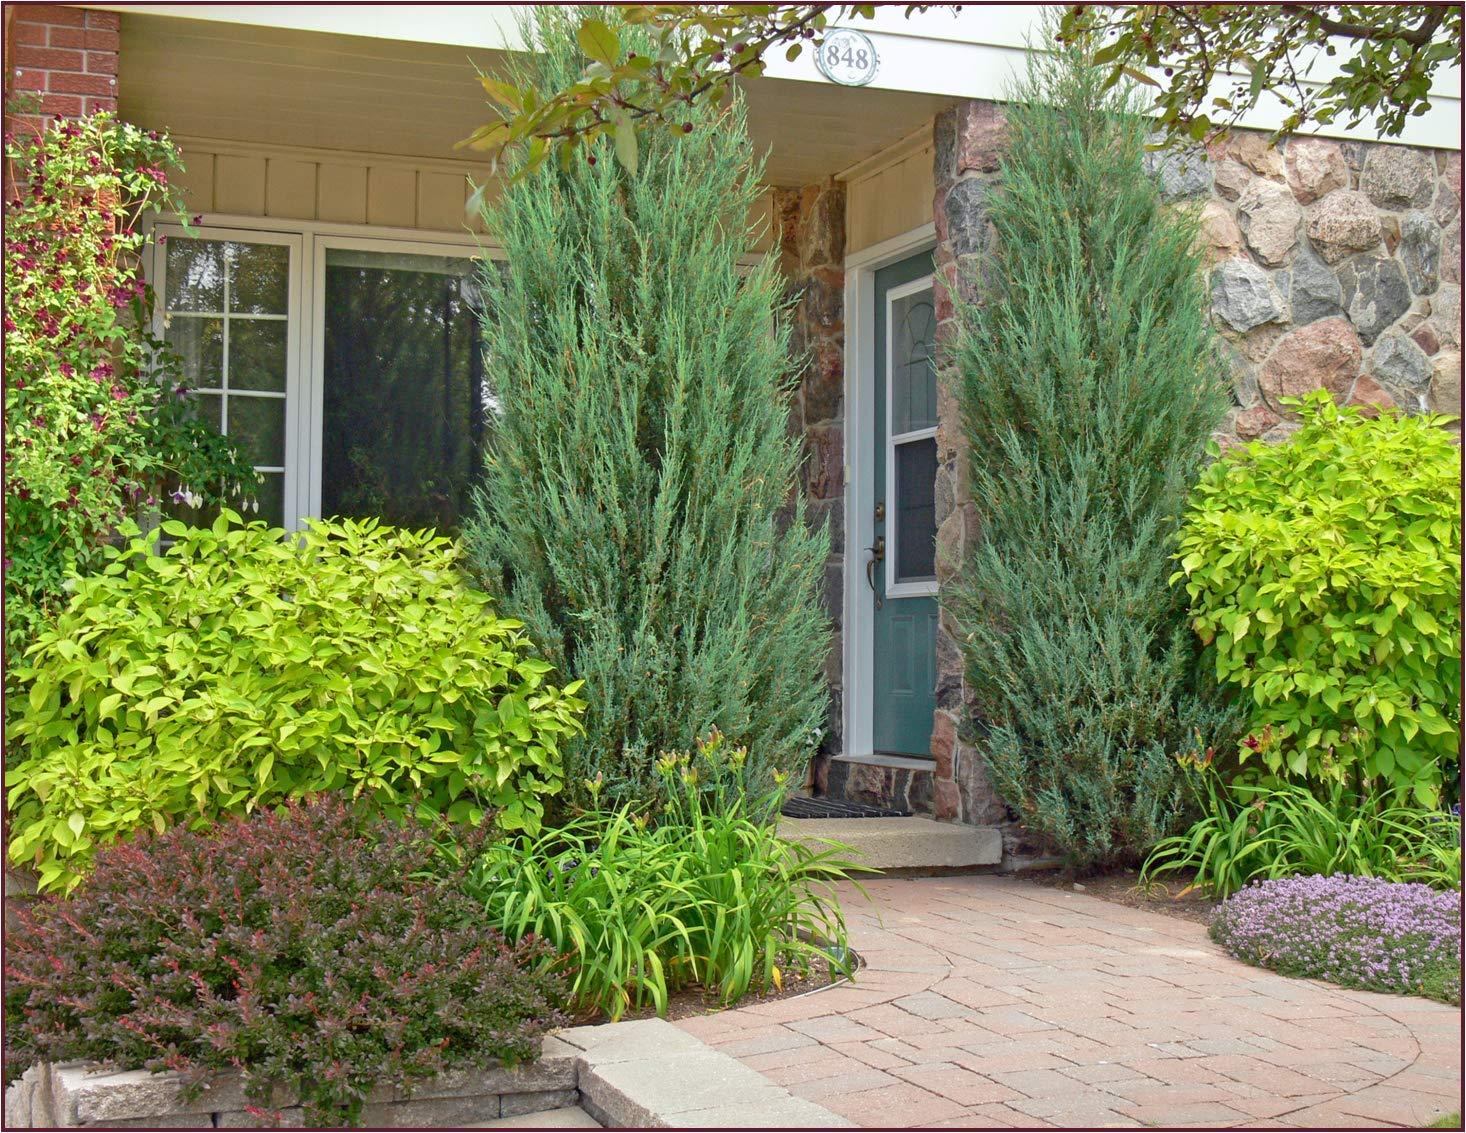 Skyrocket Juniper - 40 Live 2'' Pots - Juniperus Scopulorum - Upright Evergreen Trees by Florida Foliage (Image #5)